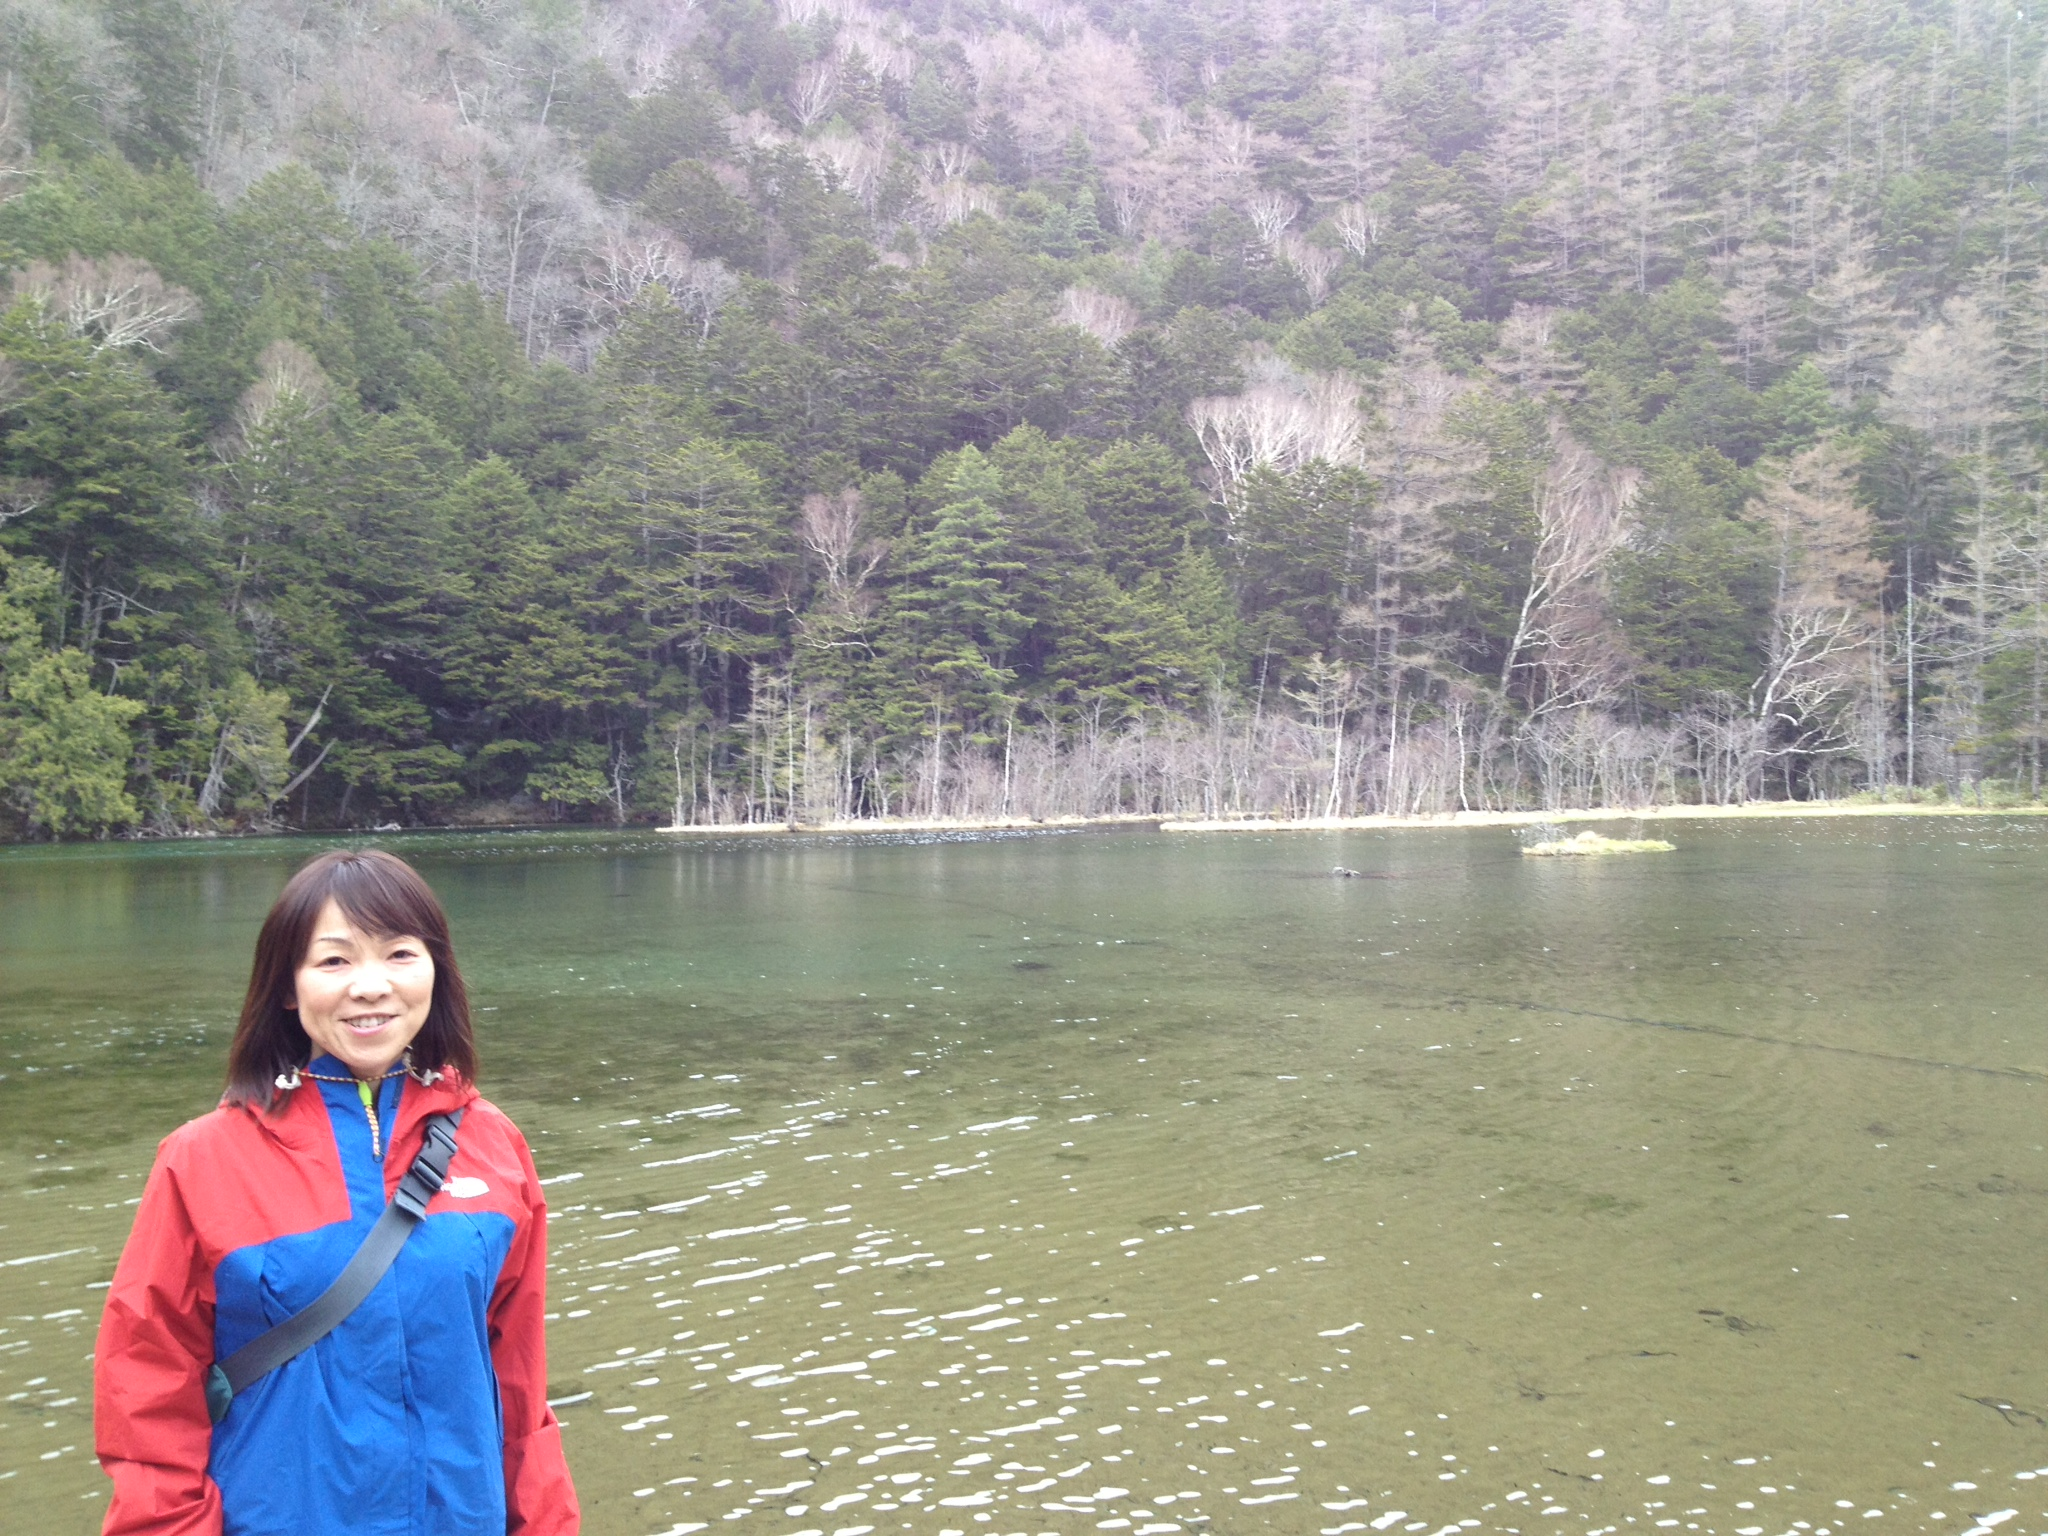 michiko fujiyama